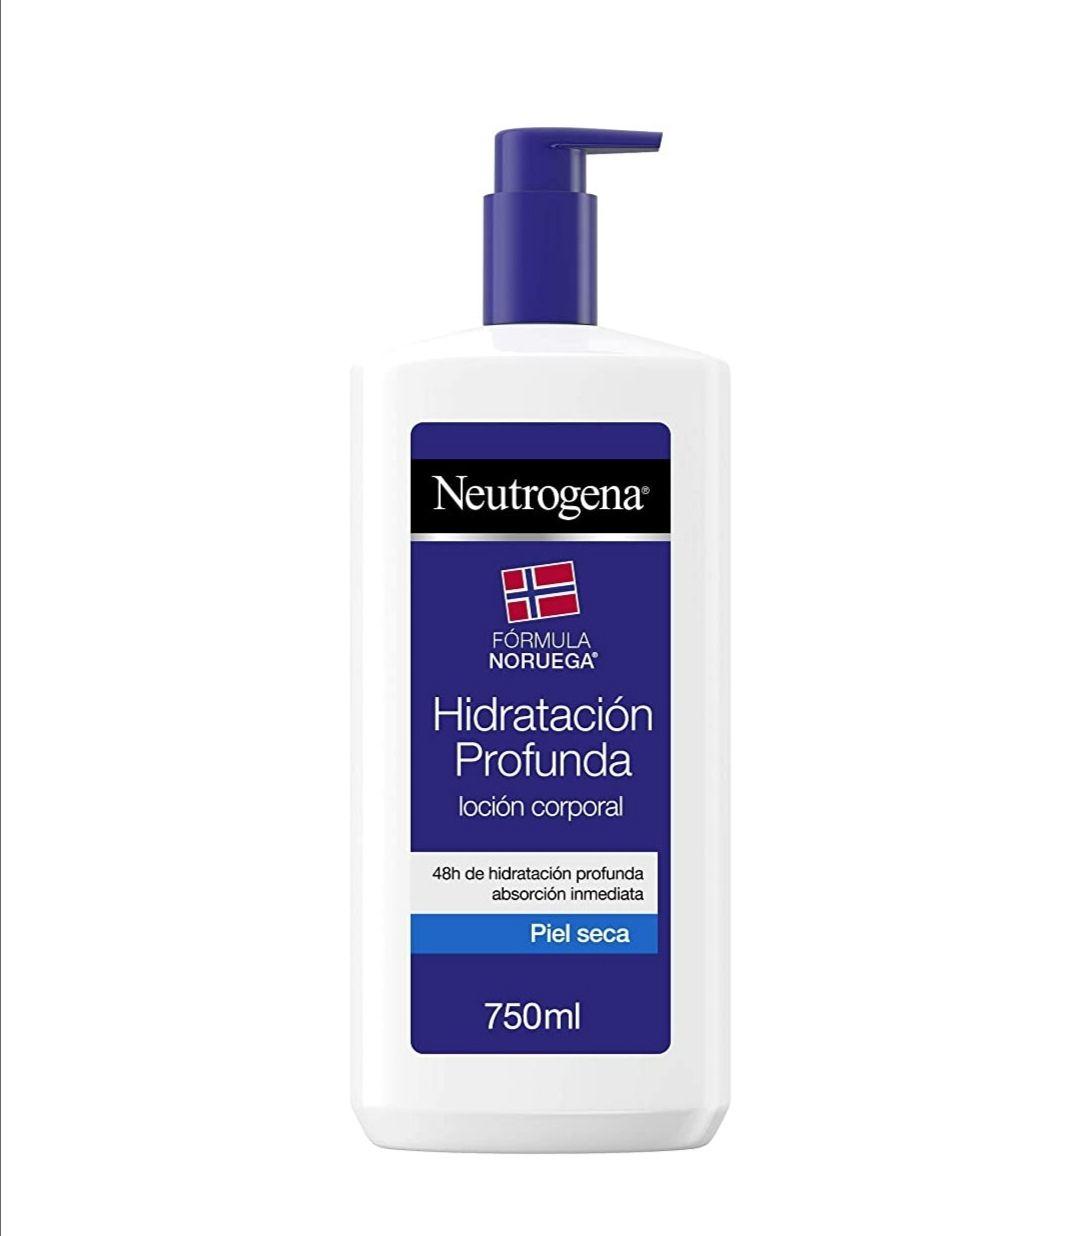 Neutrogena - Hidratación profunda 750 ml